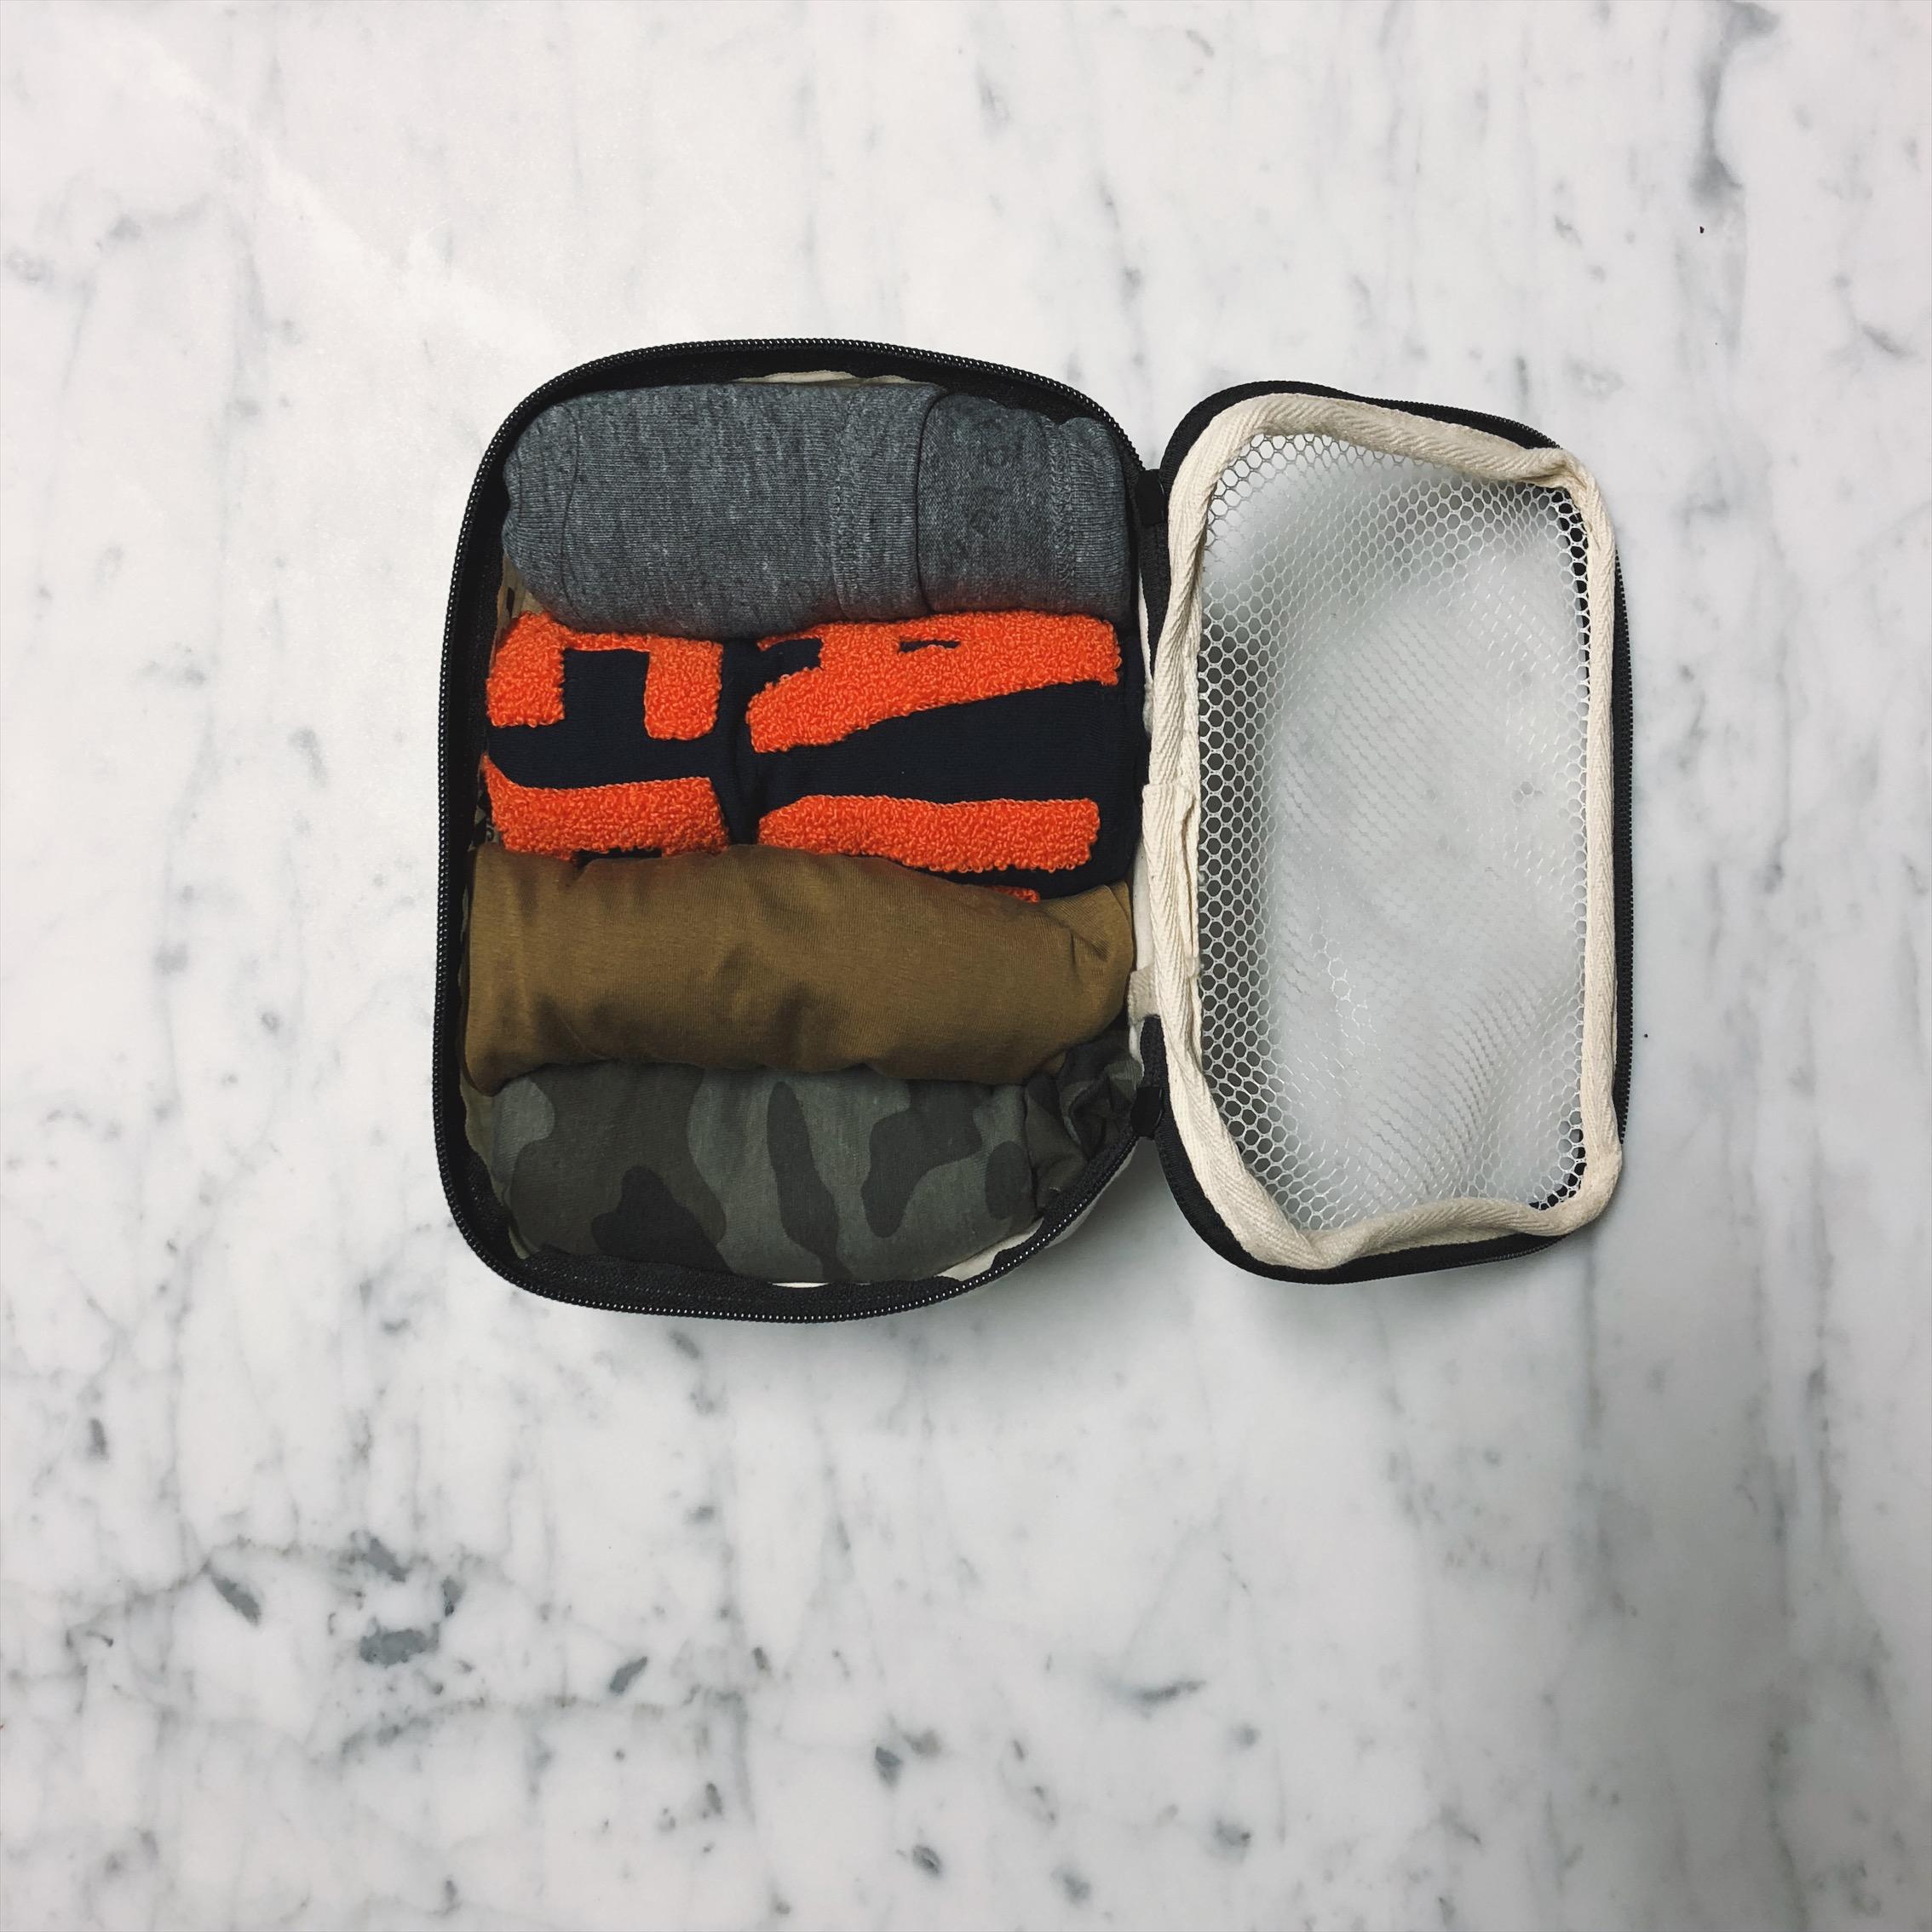 Packing cubes Bag-all (2).jpg